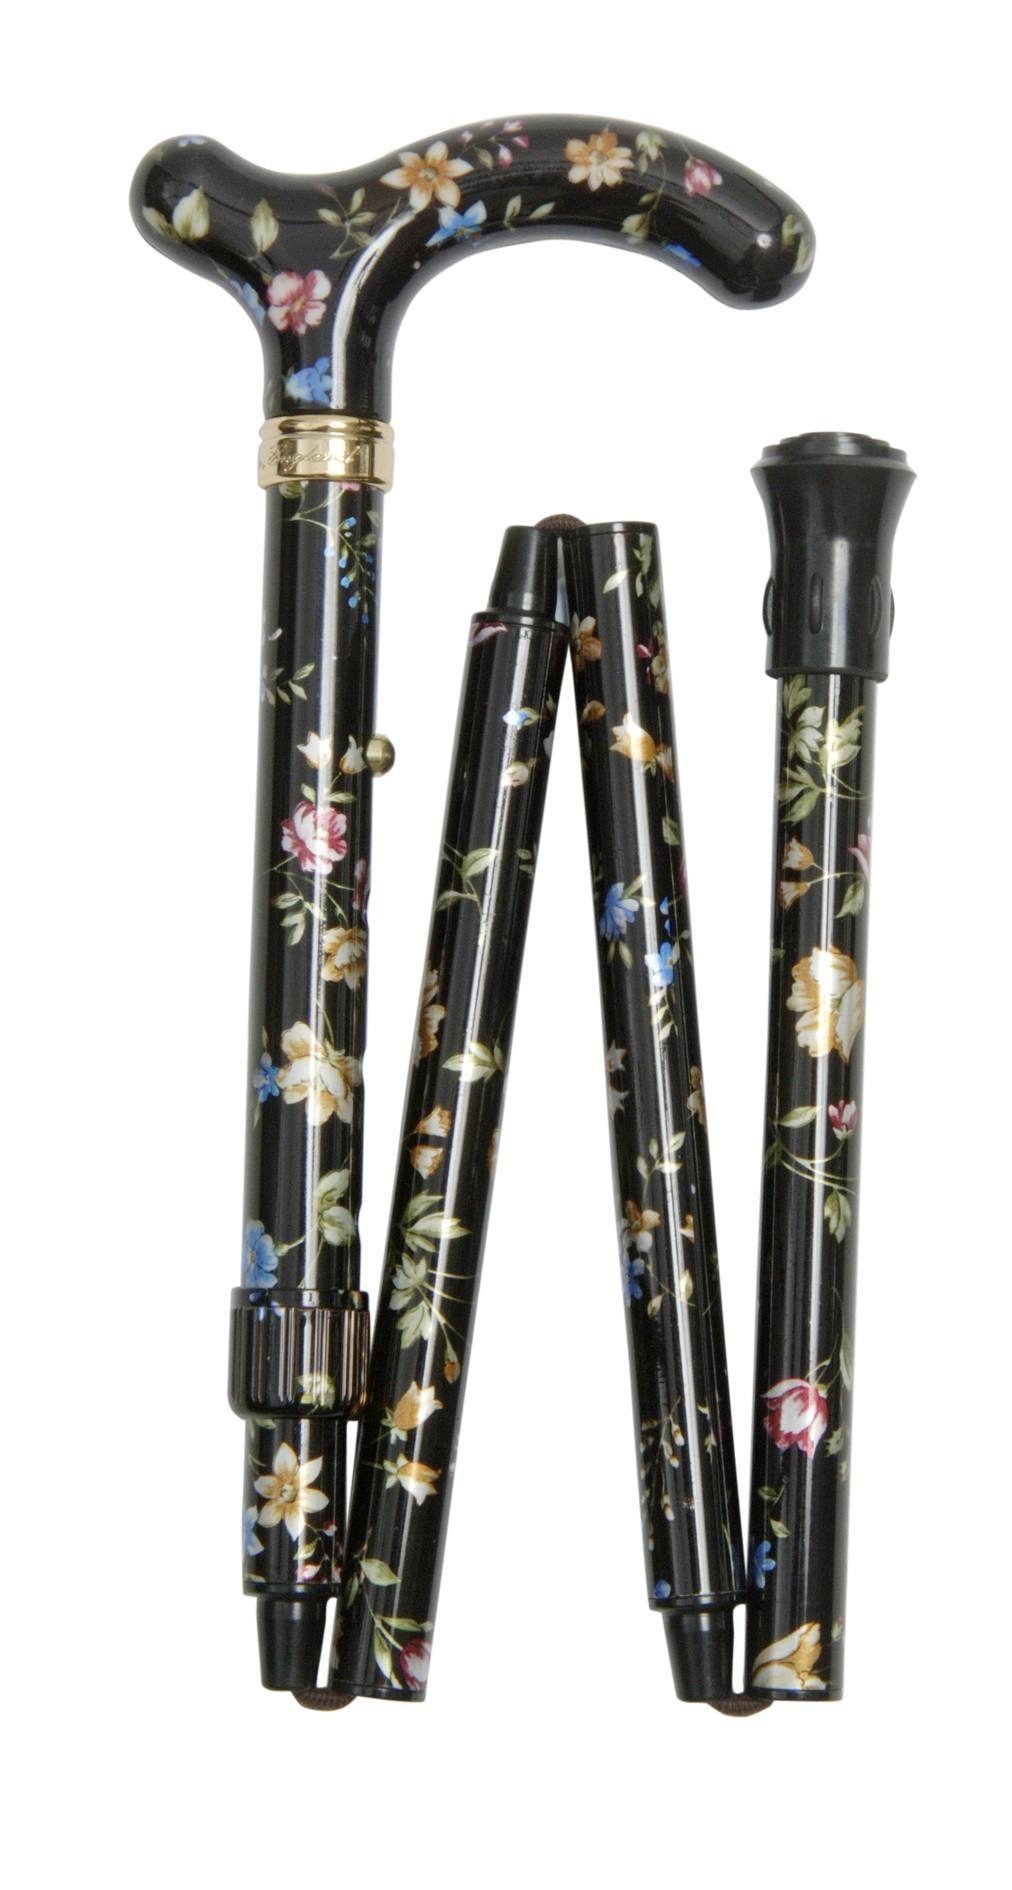 Image of   Foldbar/sammenklappelig stok, lille greb, højdejusterbar, sort med mønster